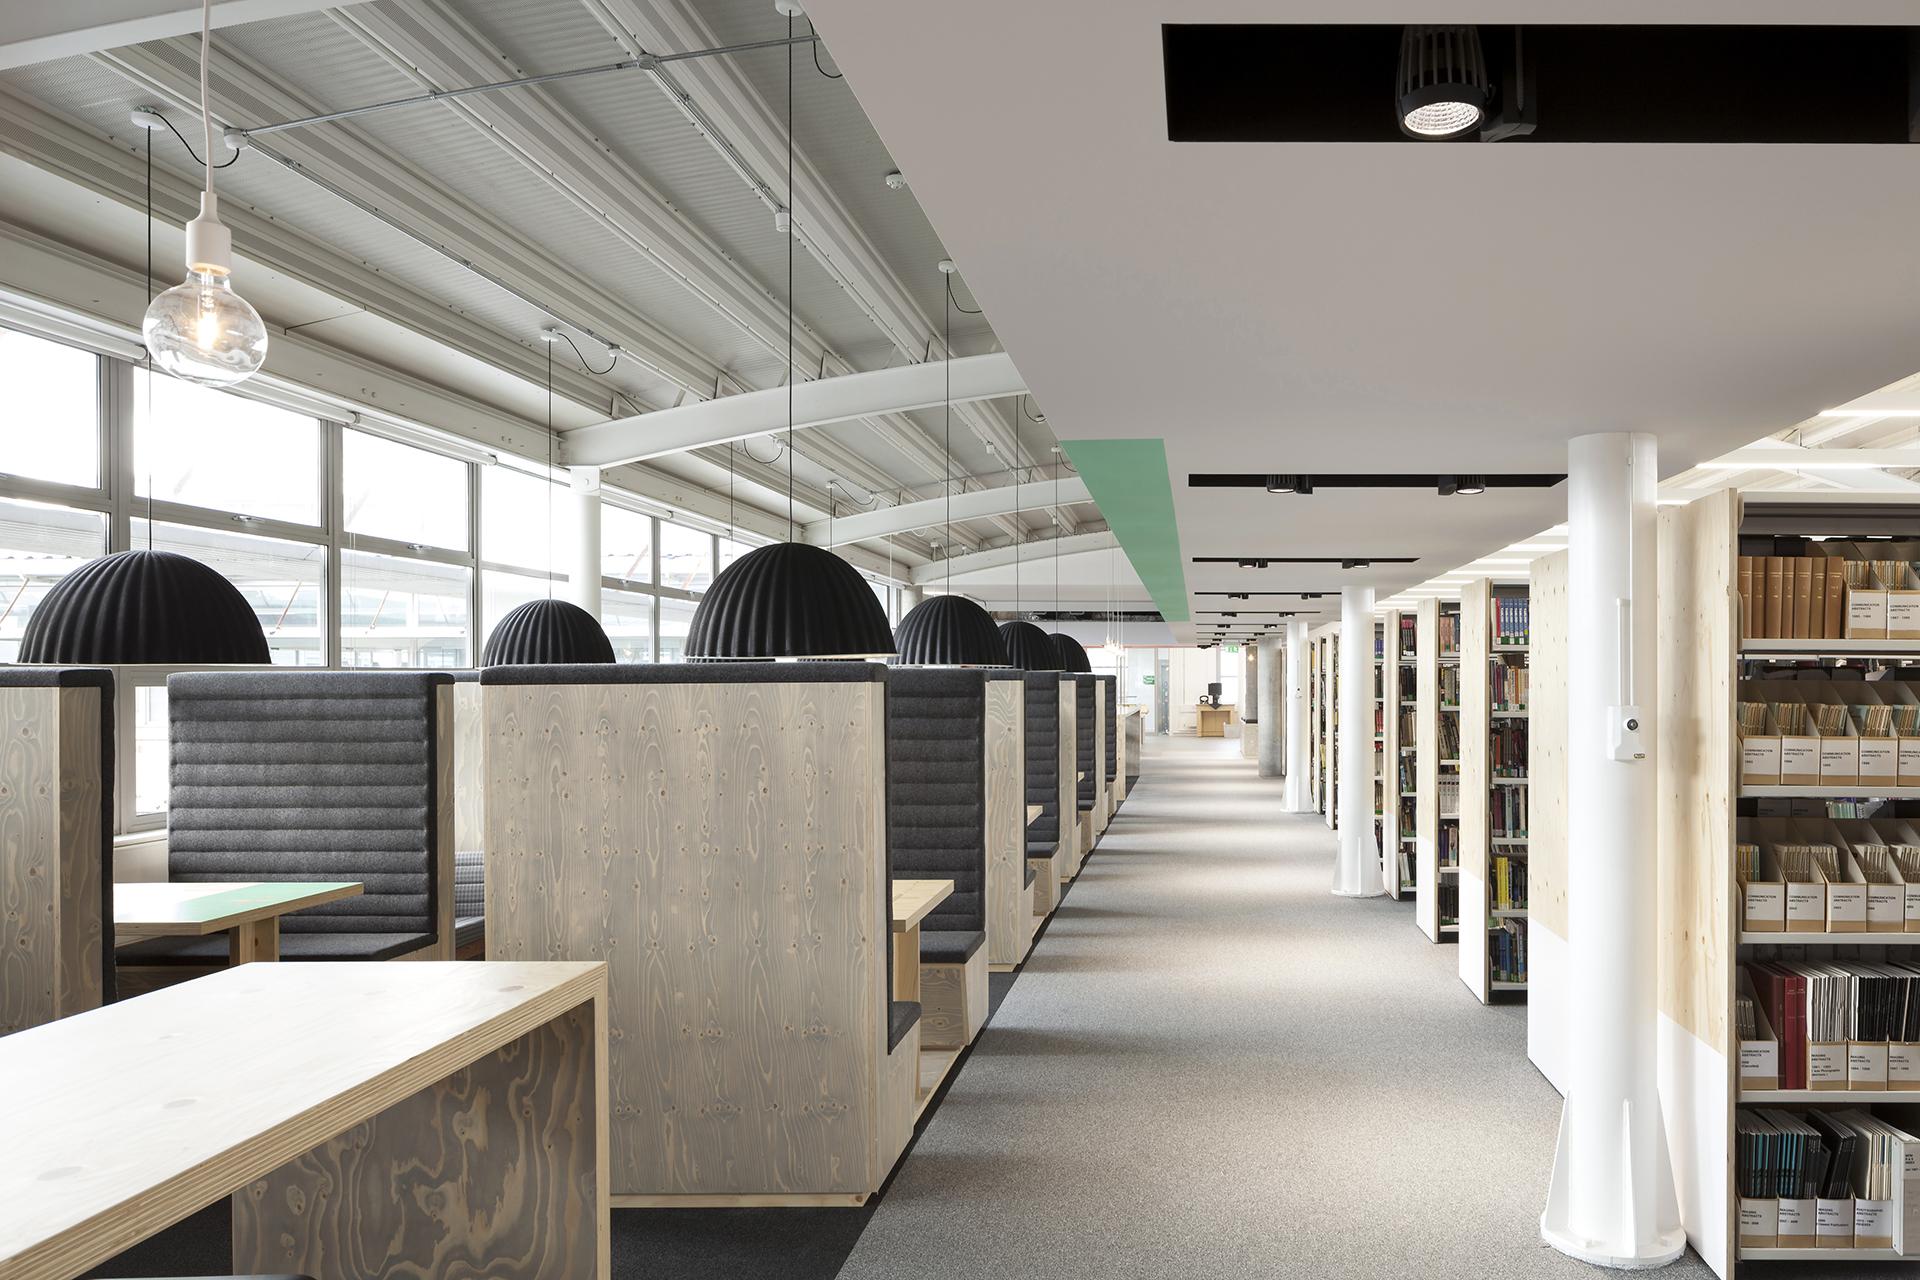 University Of Westminster Harrow Library Parkeray